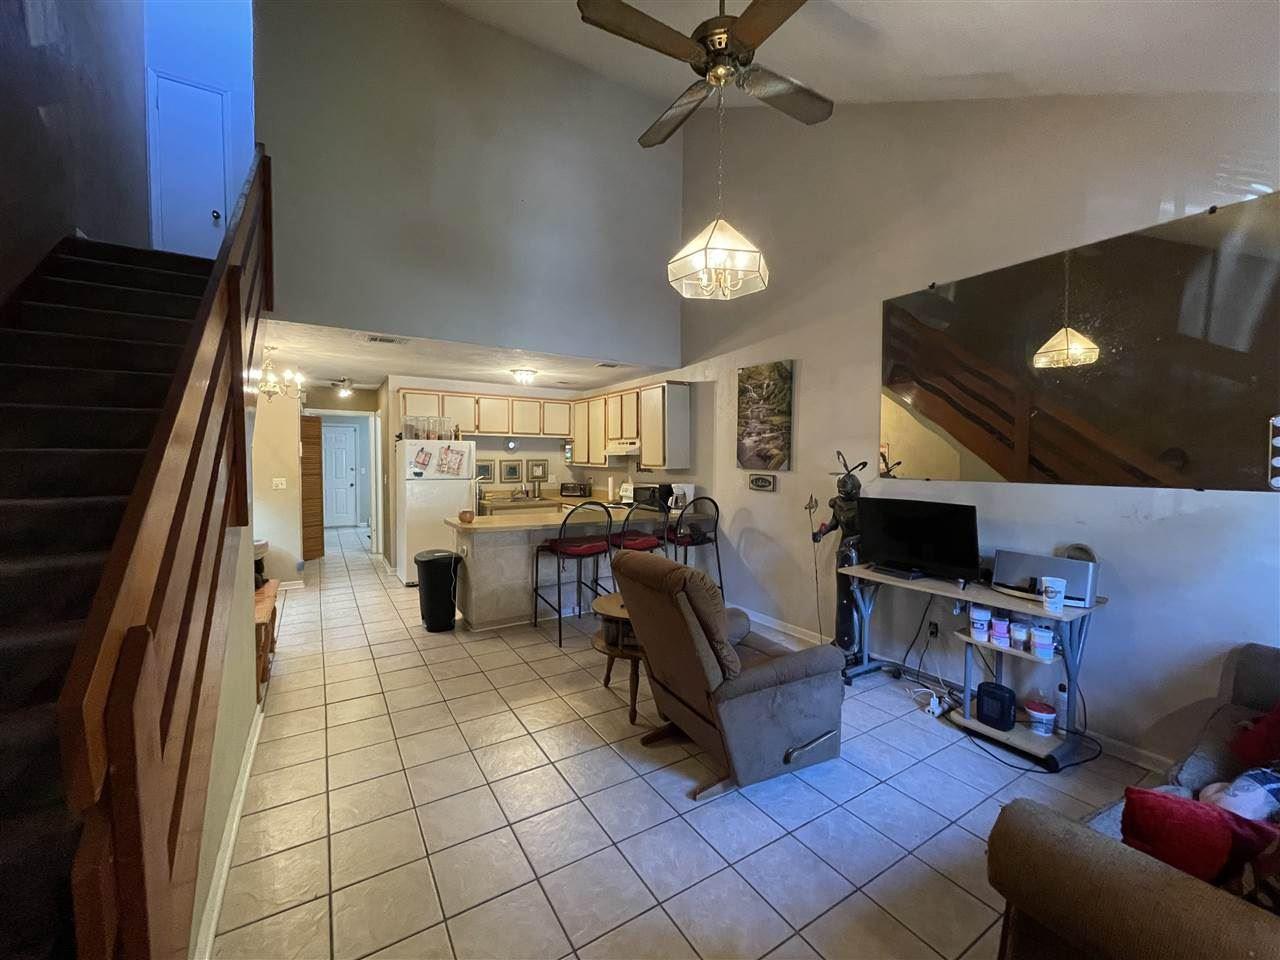 Photo of 2296 Hartsfield Way #42, TALLAHASSEE, FL 32303 (MLS # 330858)